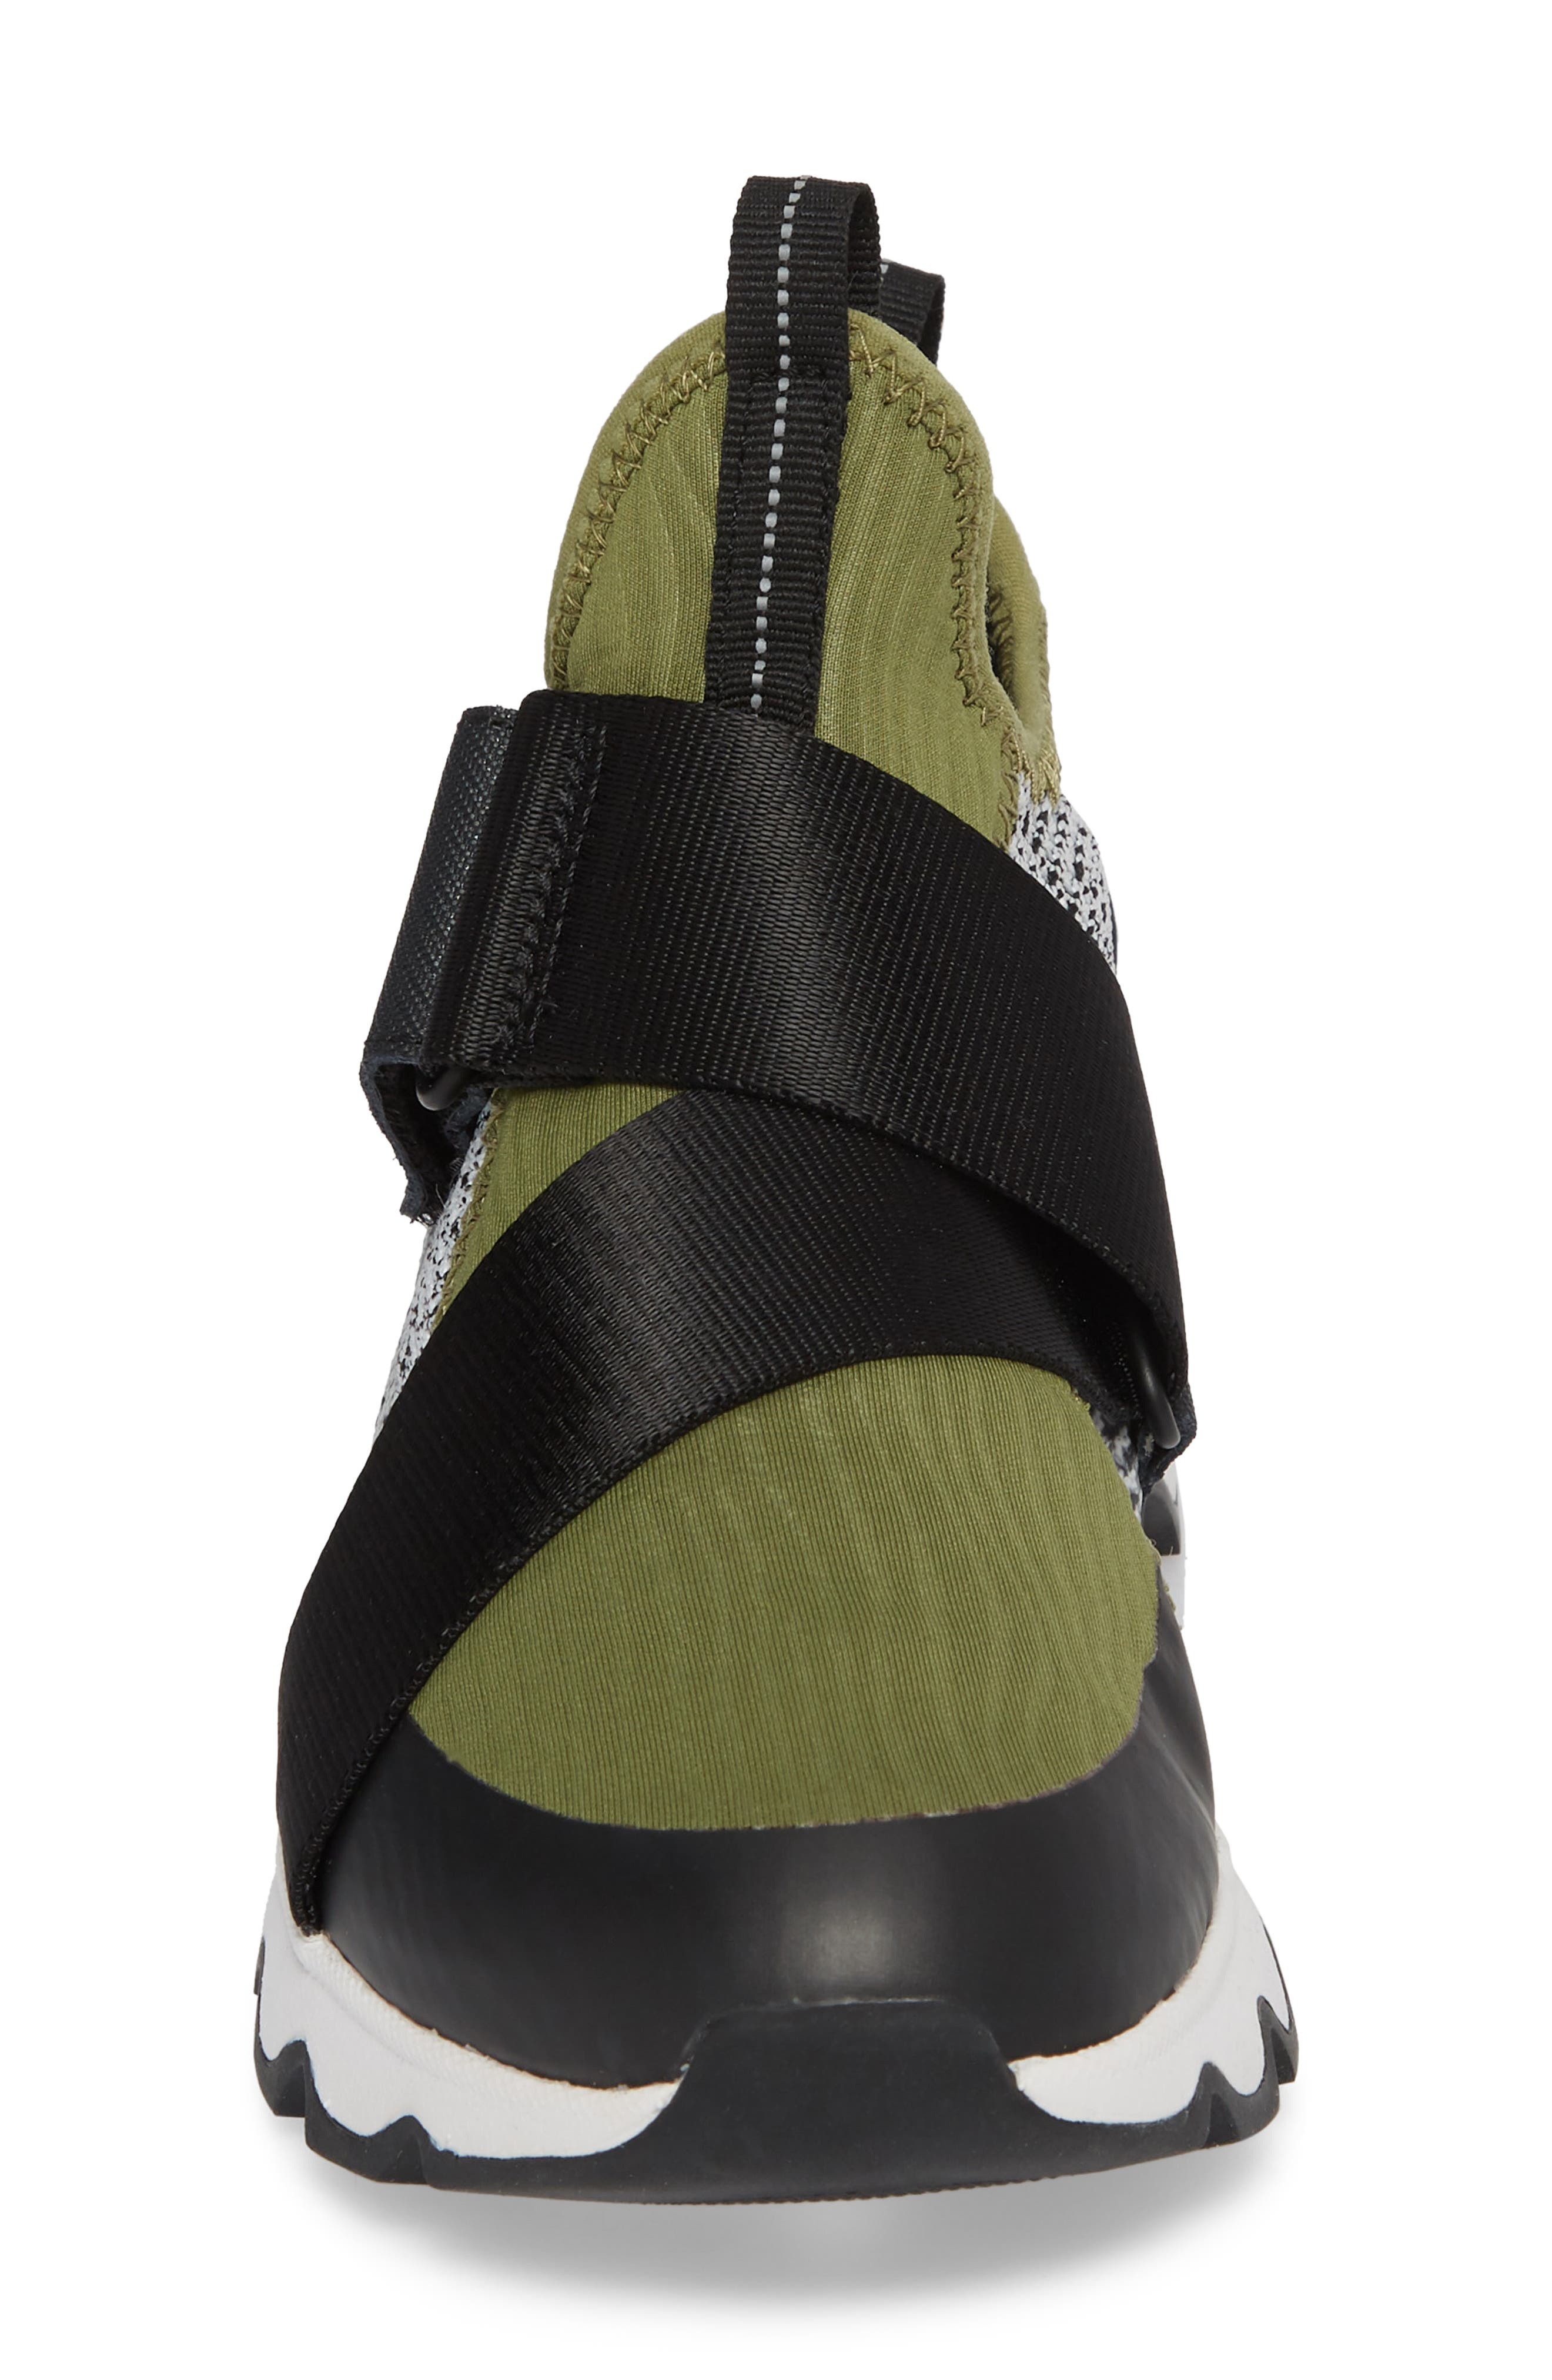 Kinetic Sneak High Top Sneaker,                             Alternate thumbnail 4, color,                             Olive Drab/ White